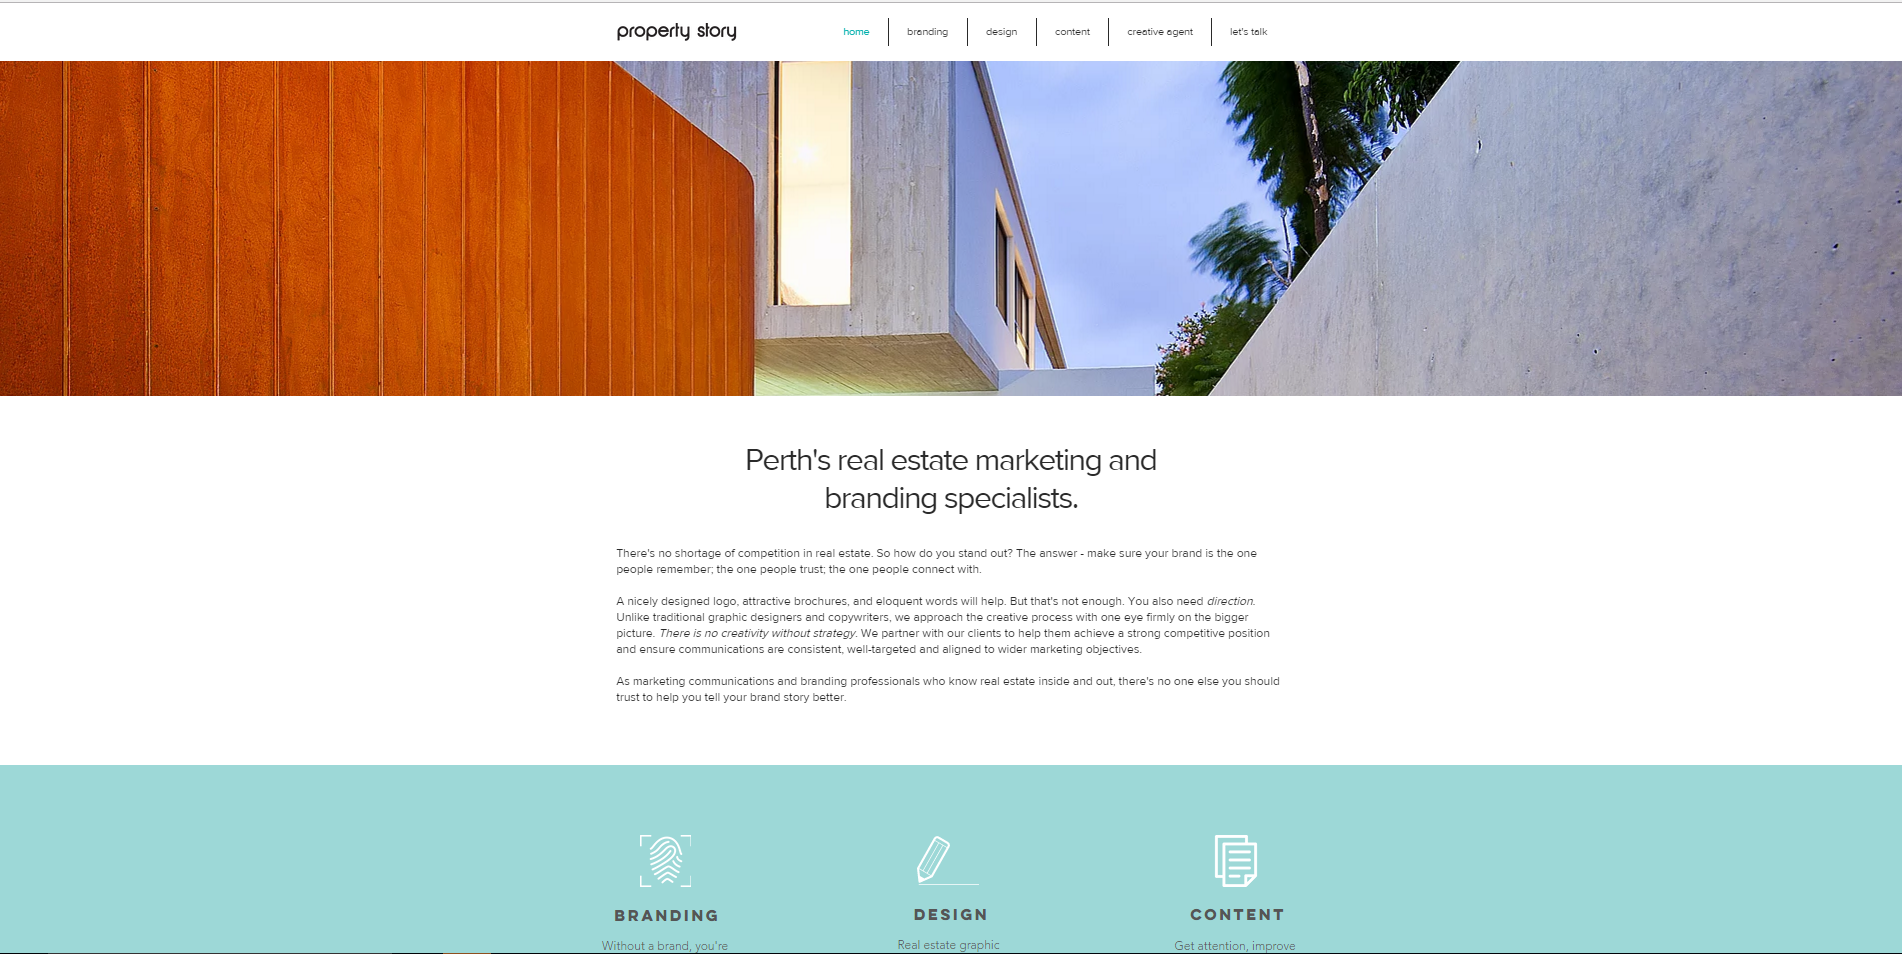 real estate marketing perth branding design copy property story